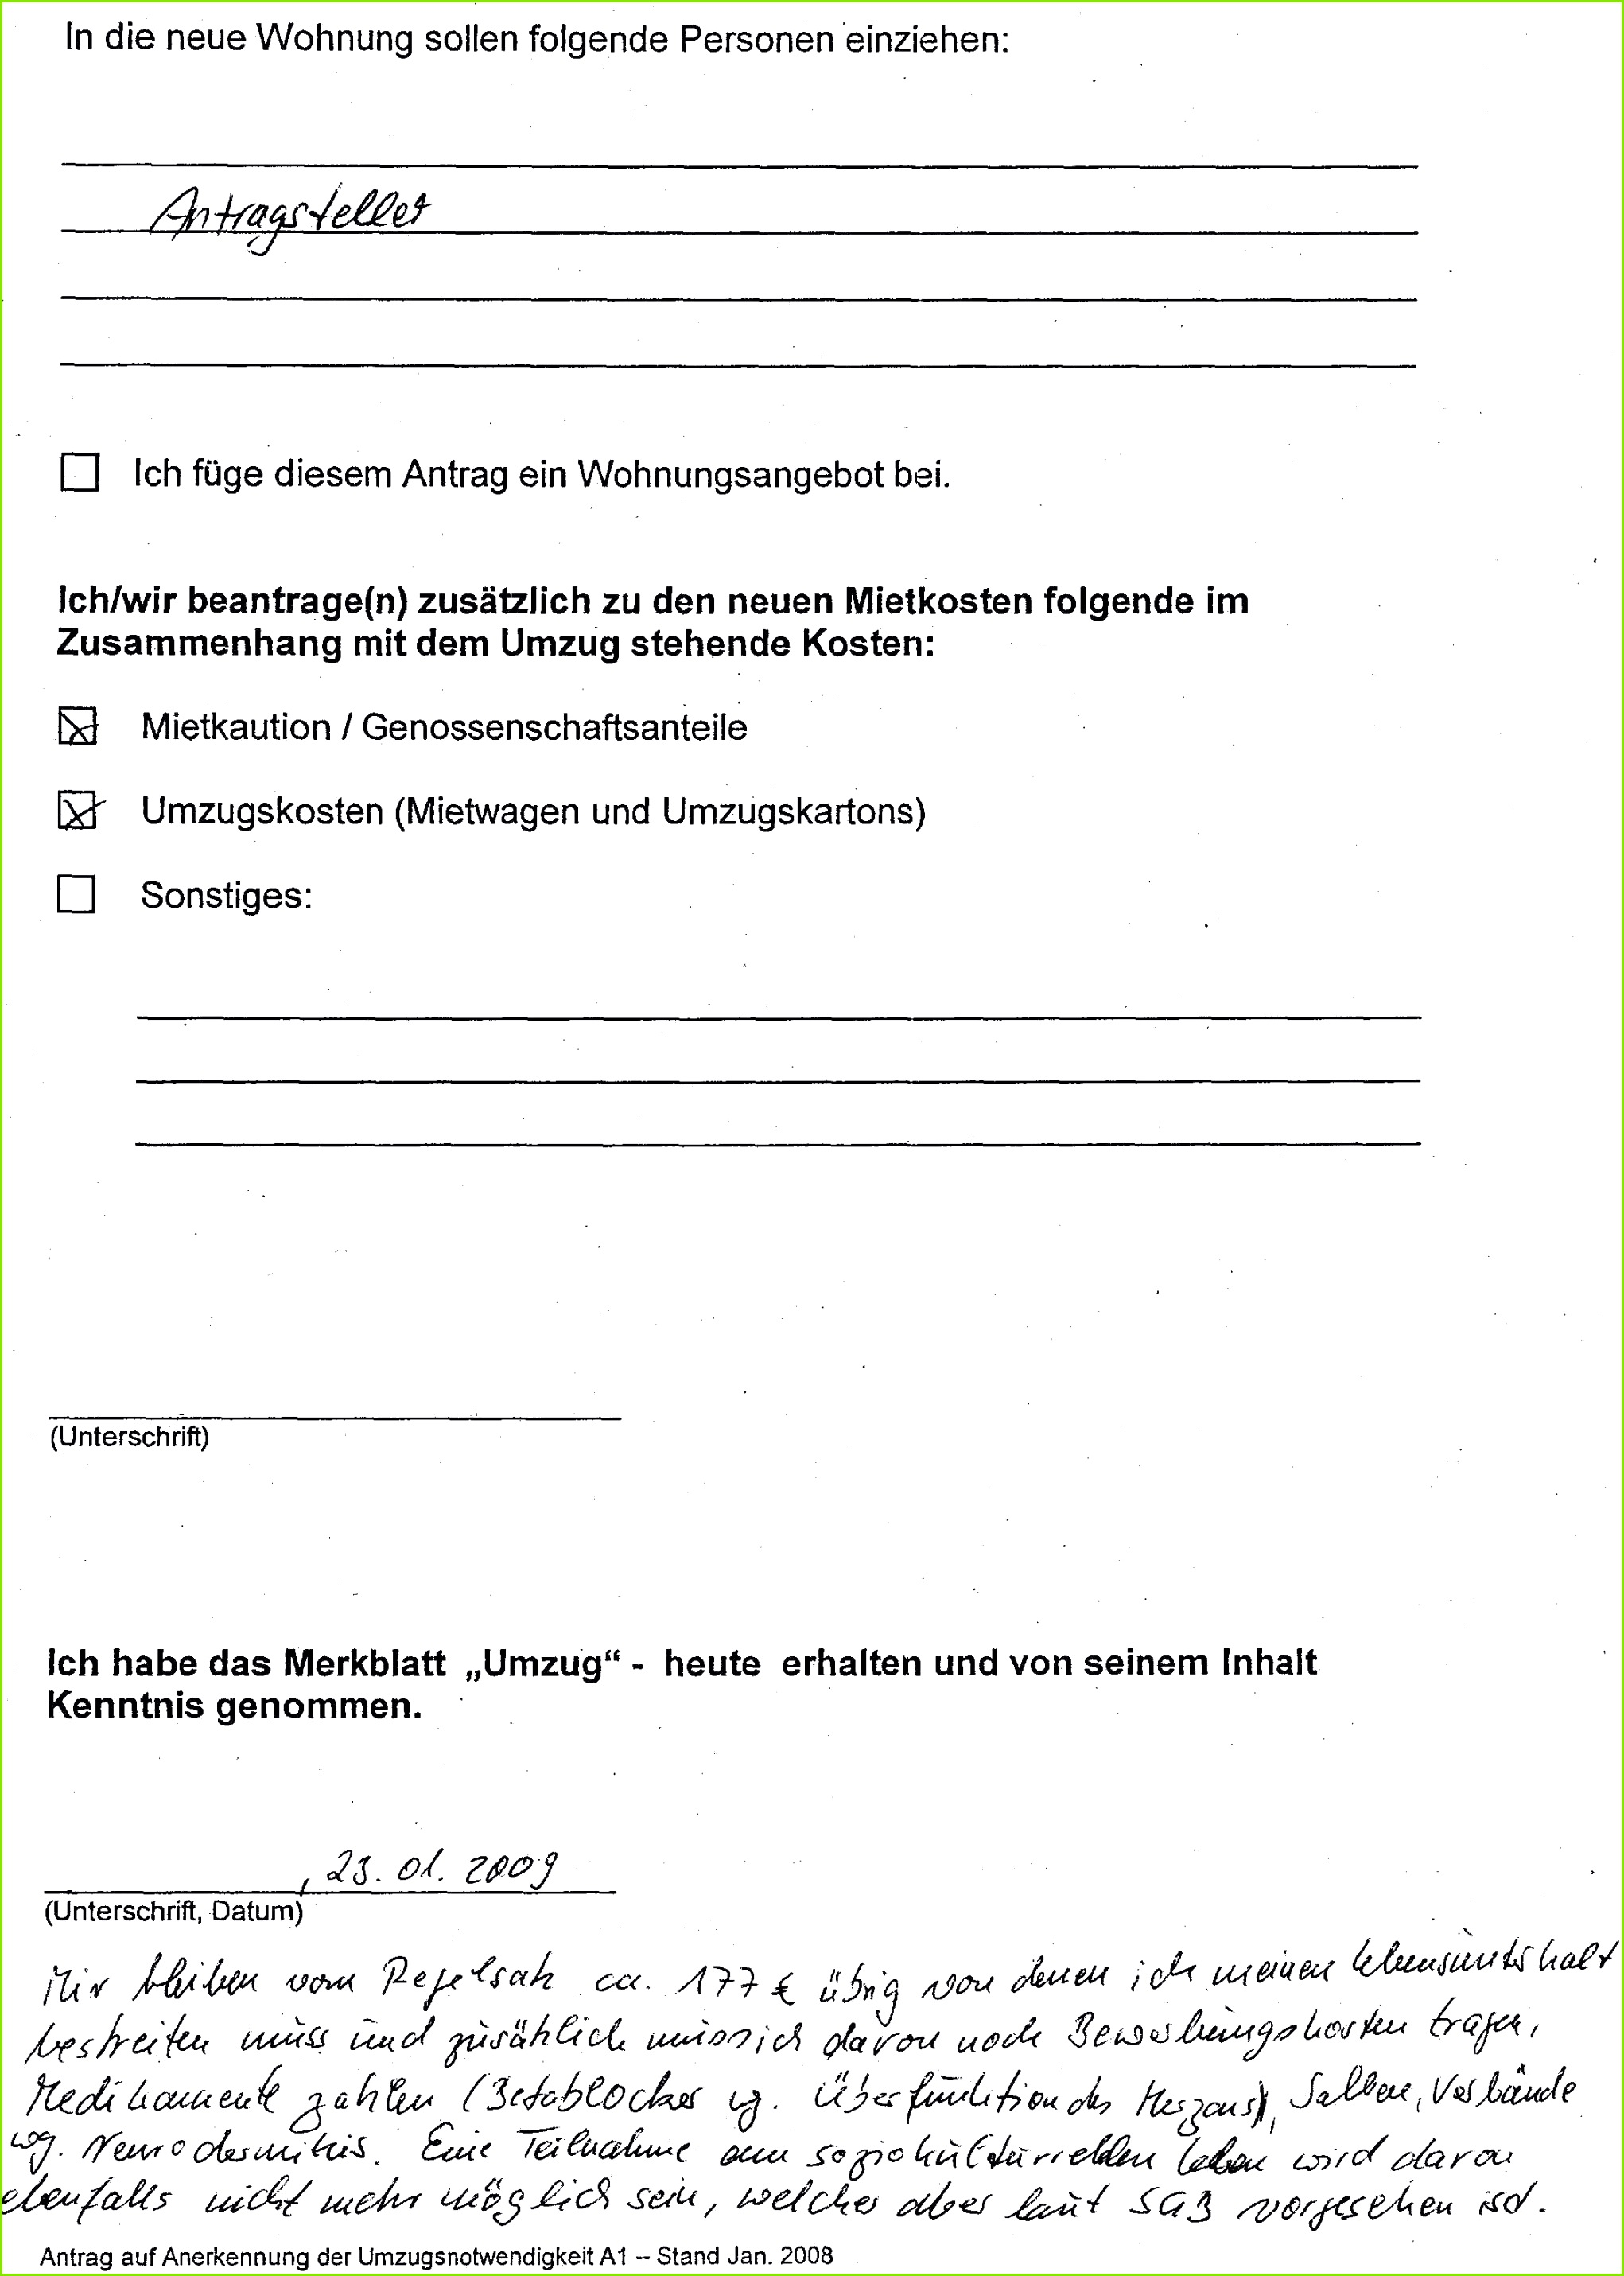 Johannaumzugskosten